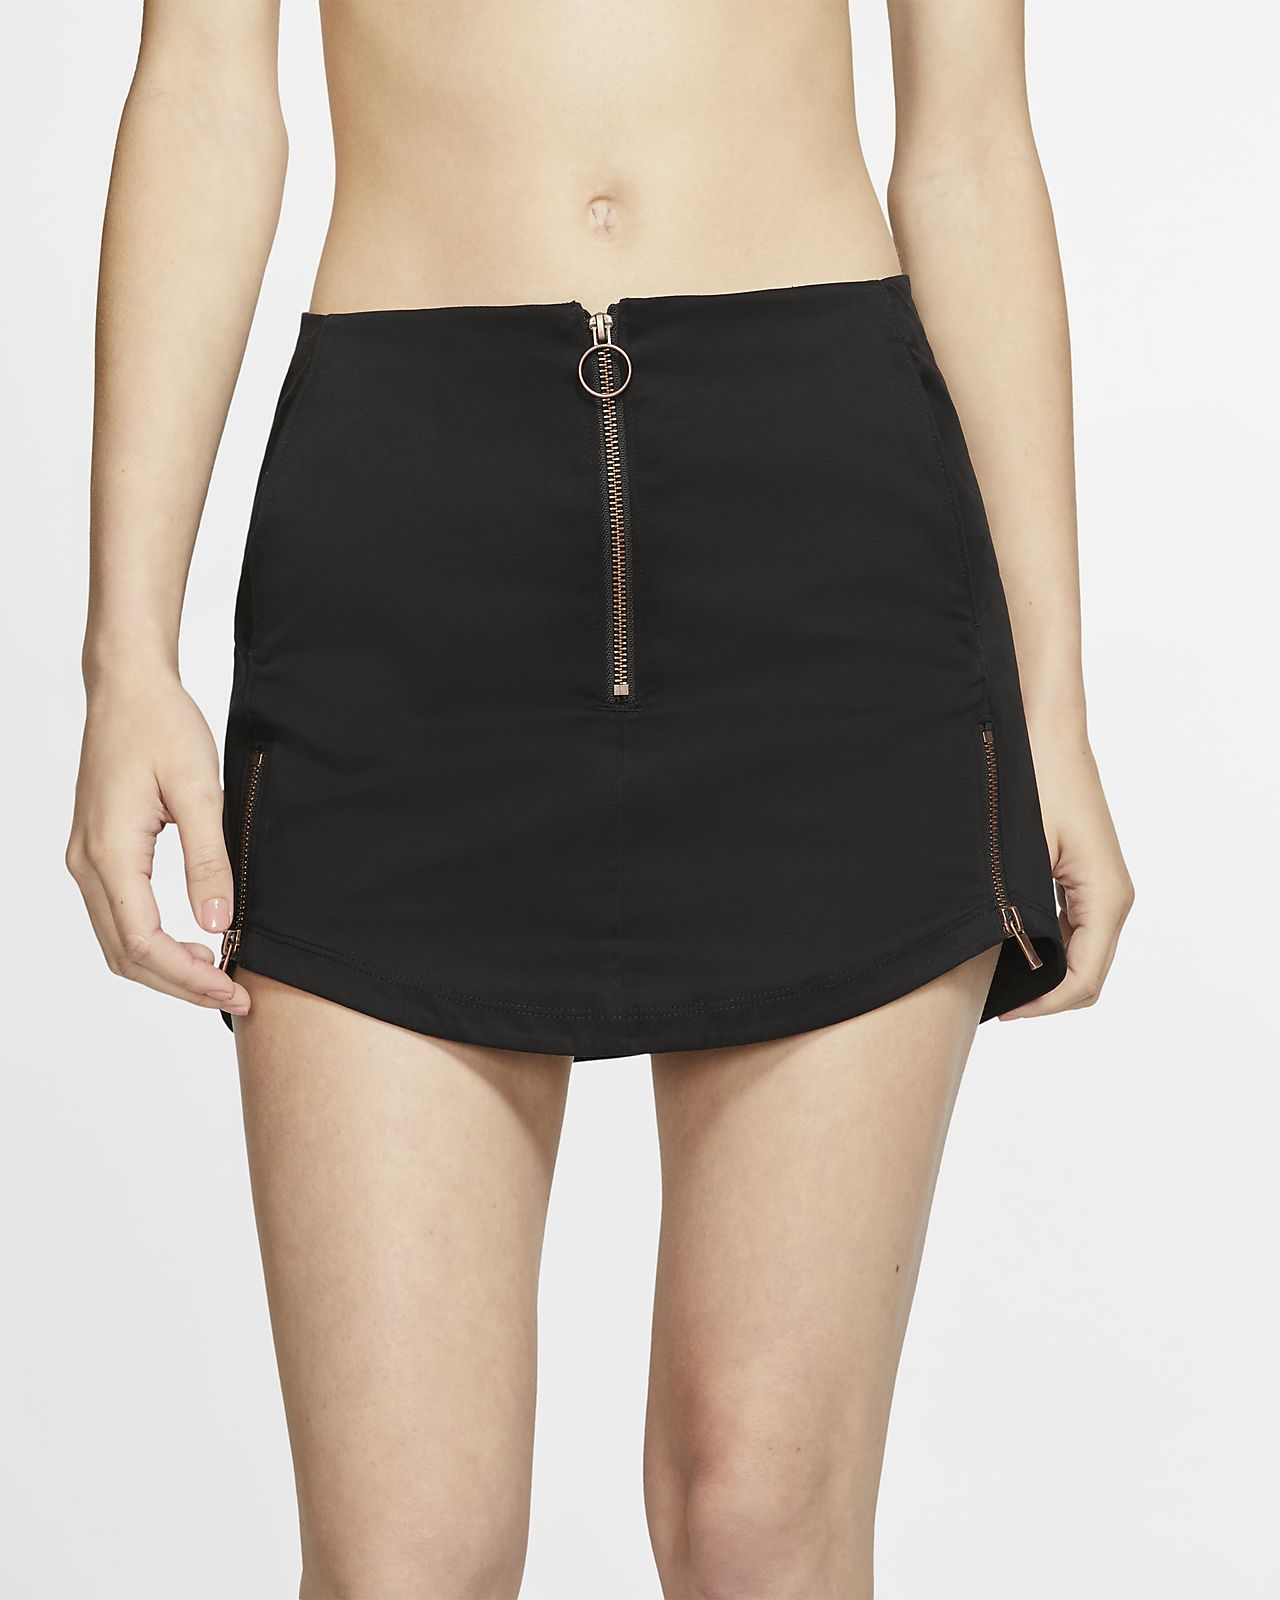 62e581f894 Hurley Sueded Zip Women's Skirt. Nike.com CA